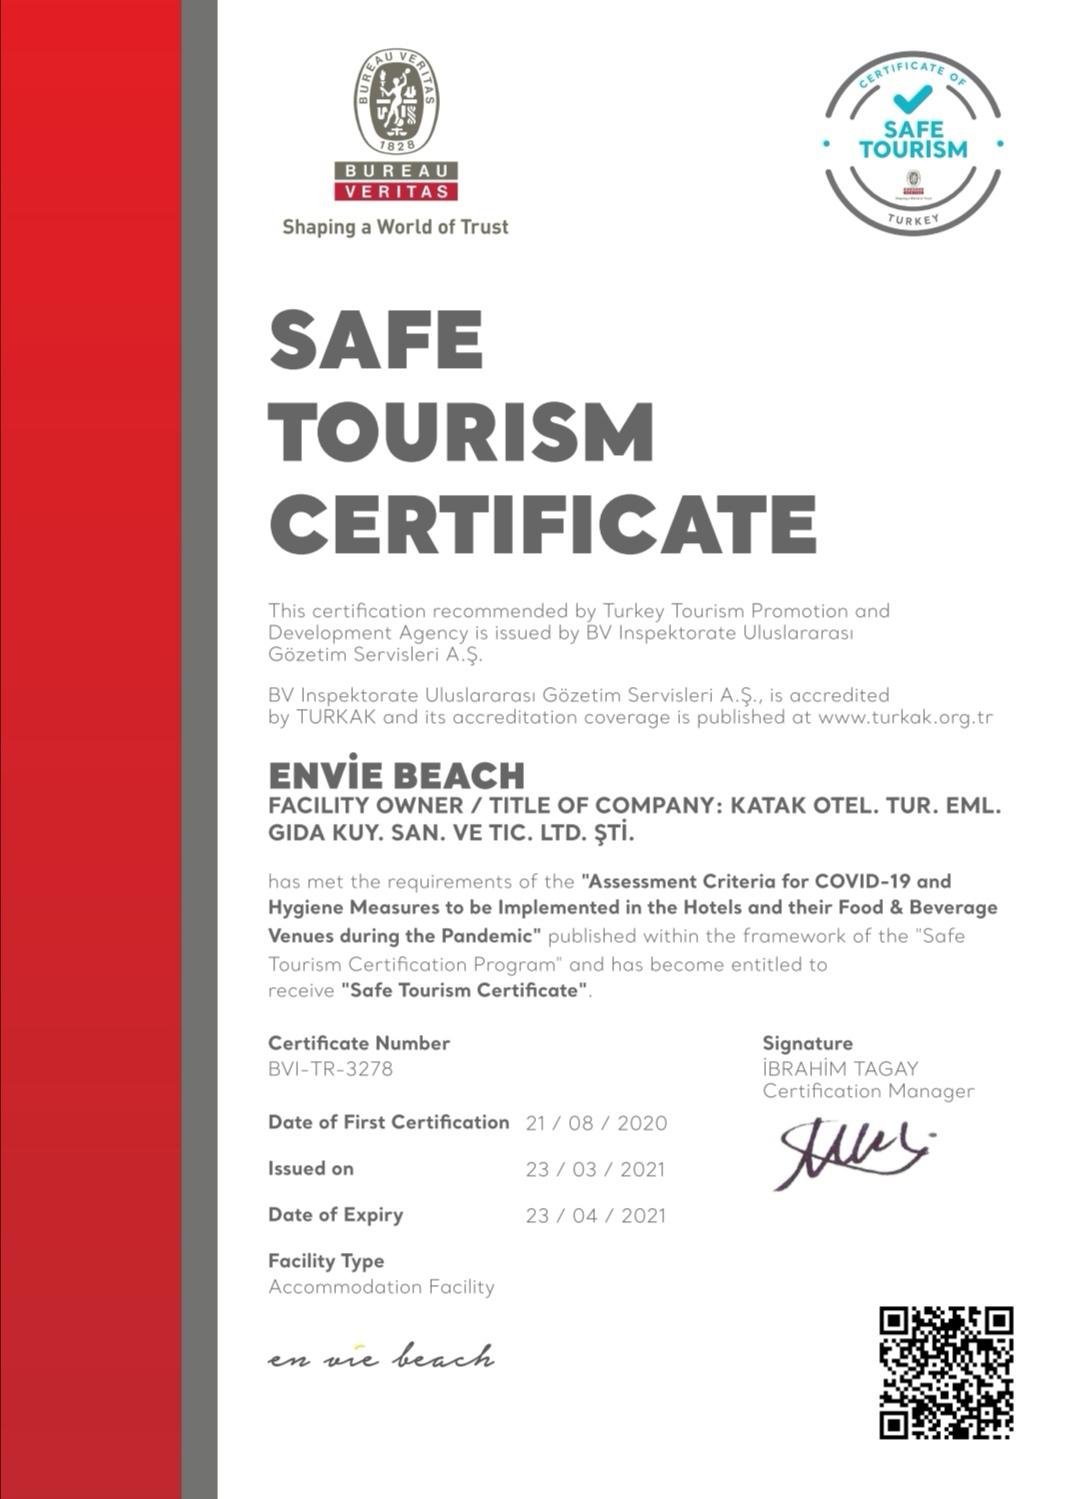 Safe tourism certificate covid-19 hygenic restaurant hotel alanya turkey